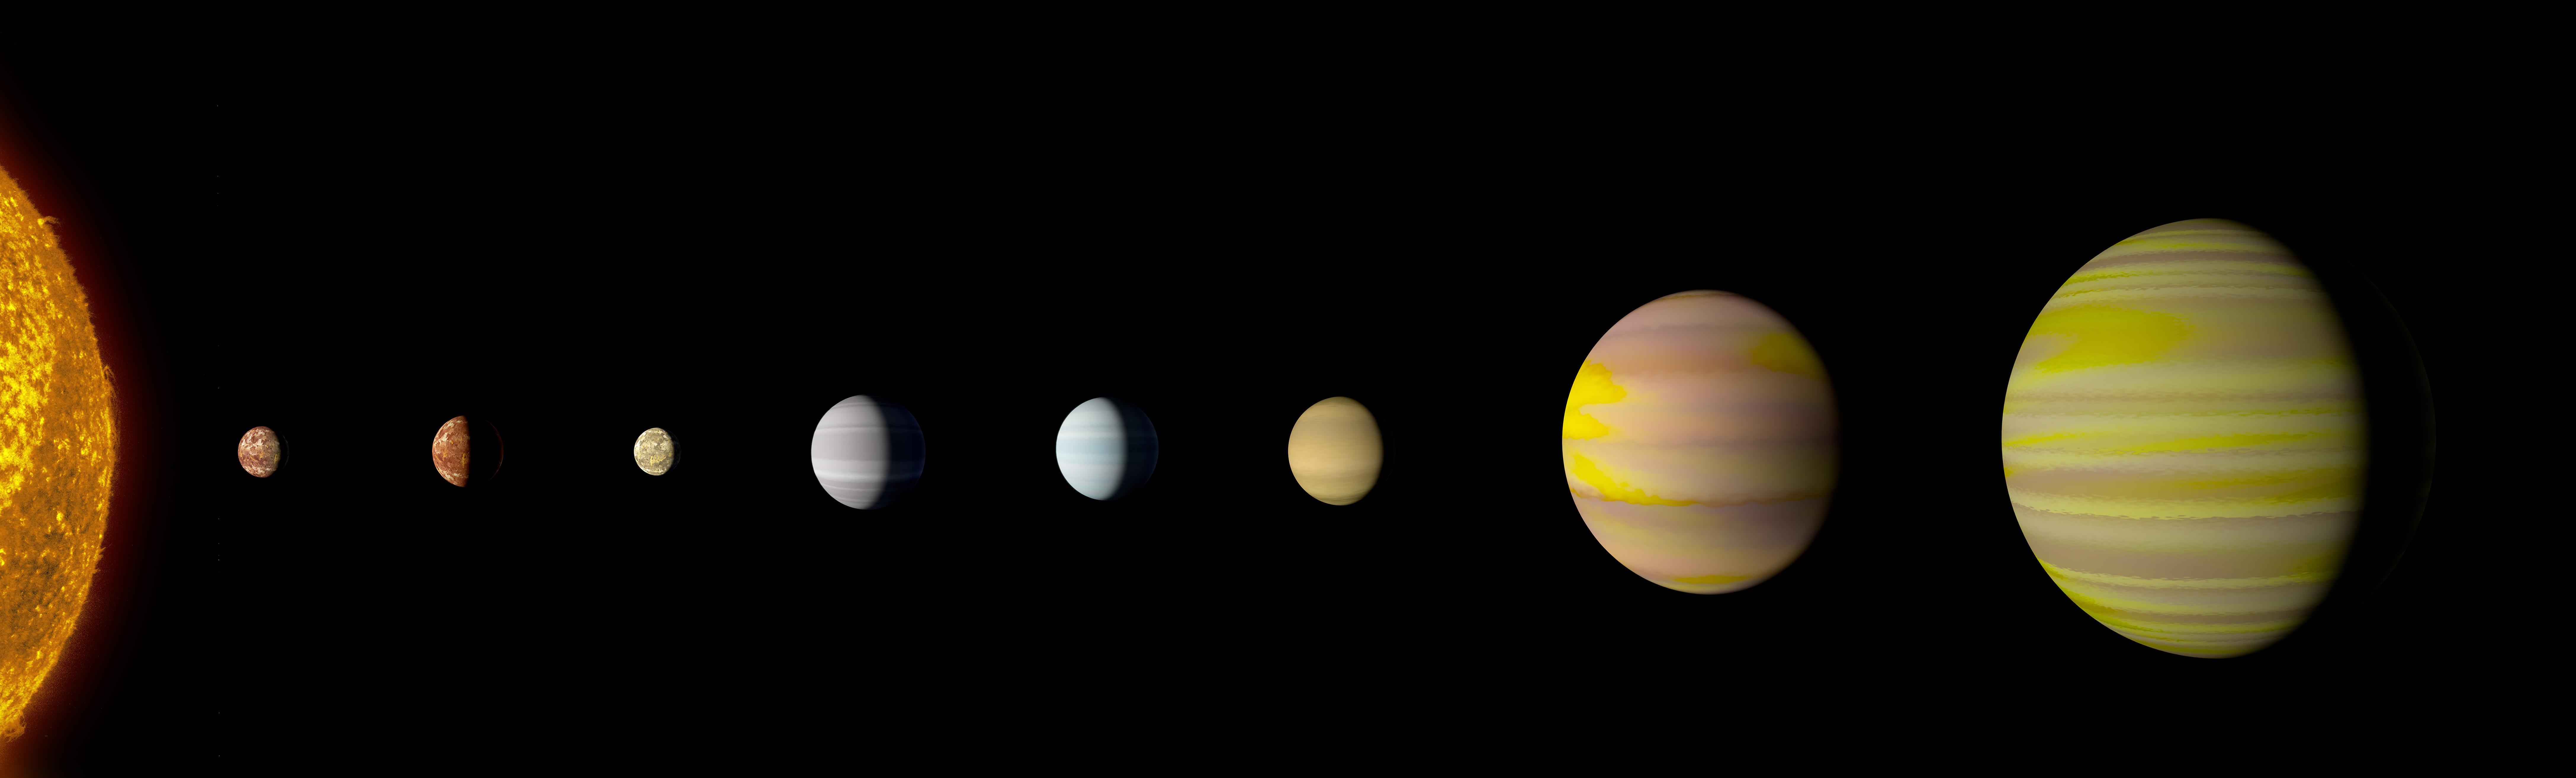 8 planet solar system